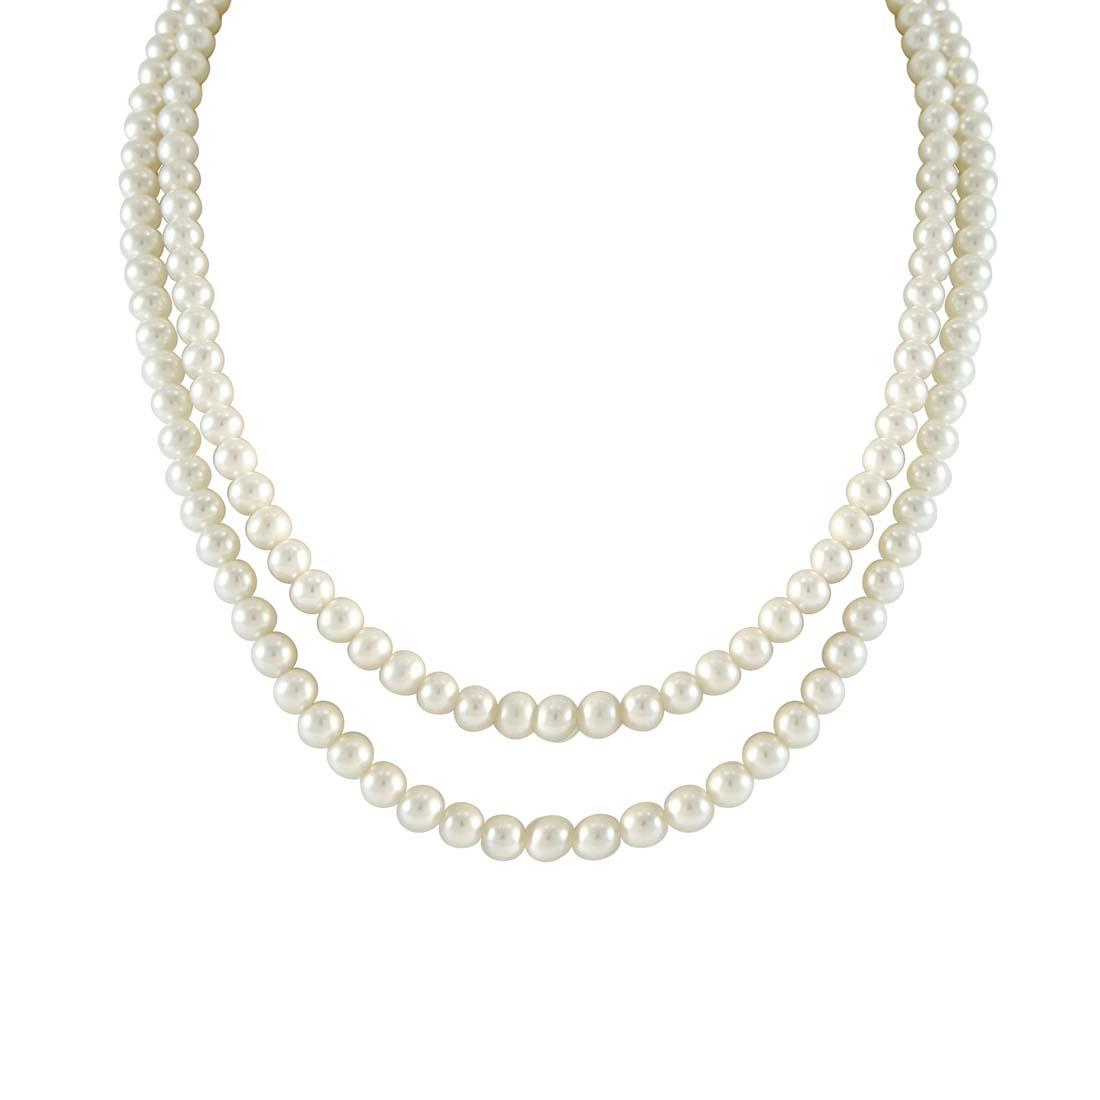 Collana di perle Freshwater  - ORO&CO